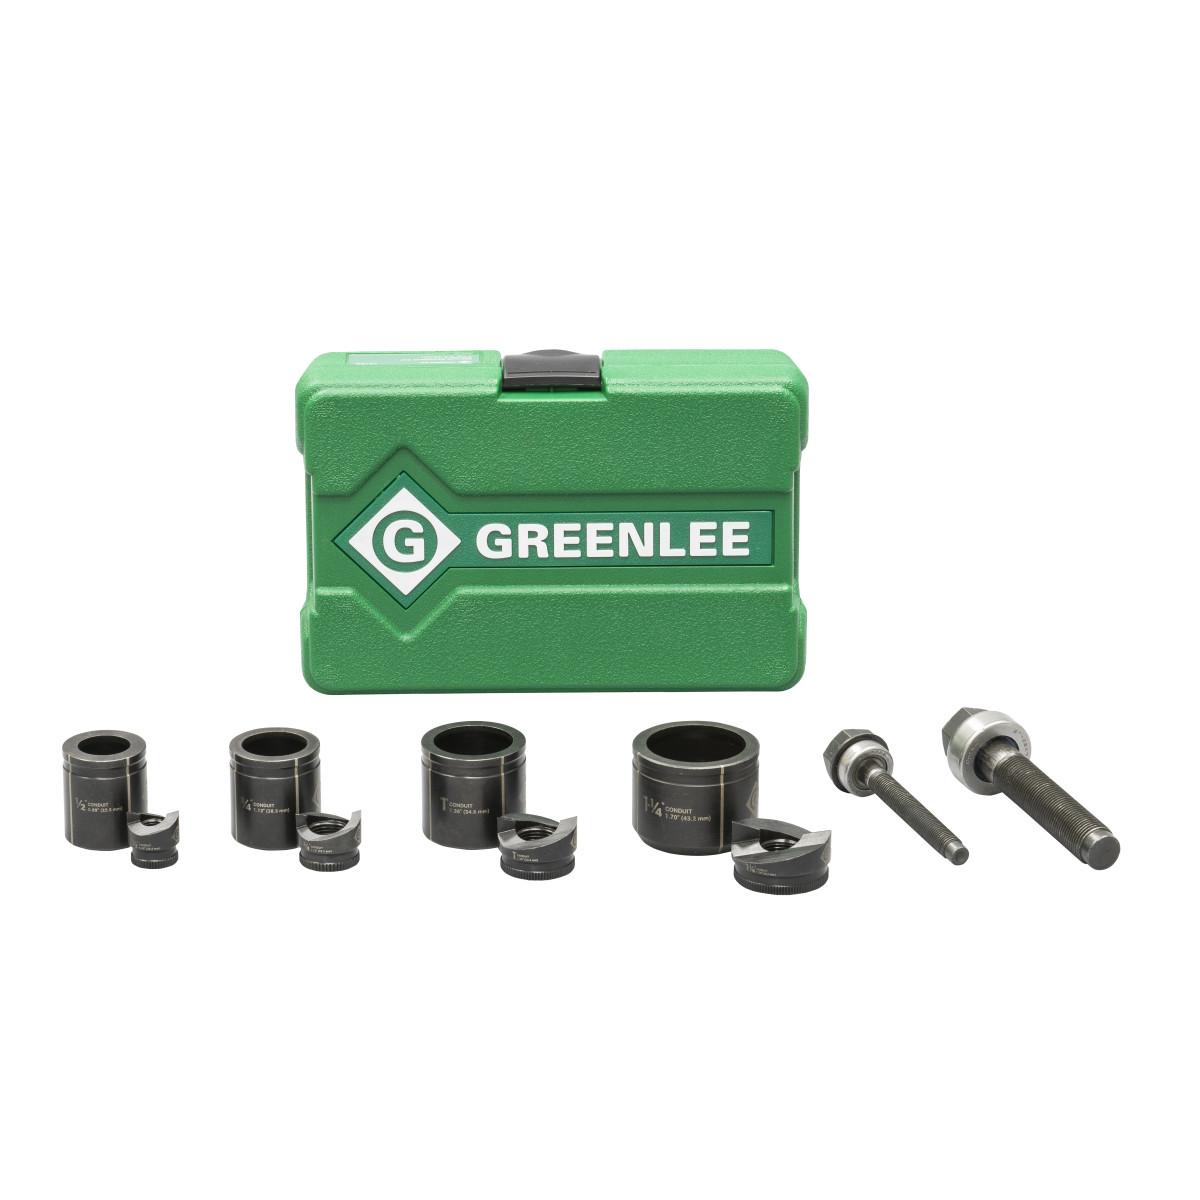 "Greenlee 7235BB Slug-Buster Manual Knockout Punch Kit w/ 1/2"" - 1-1/4"" Dies"